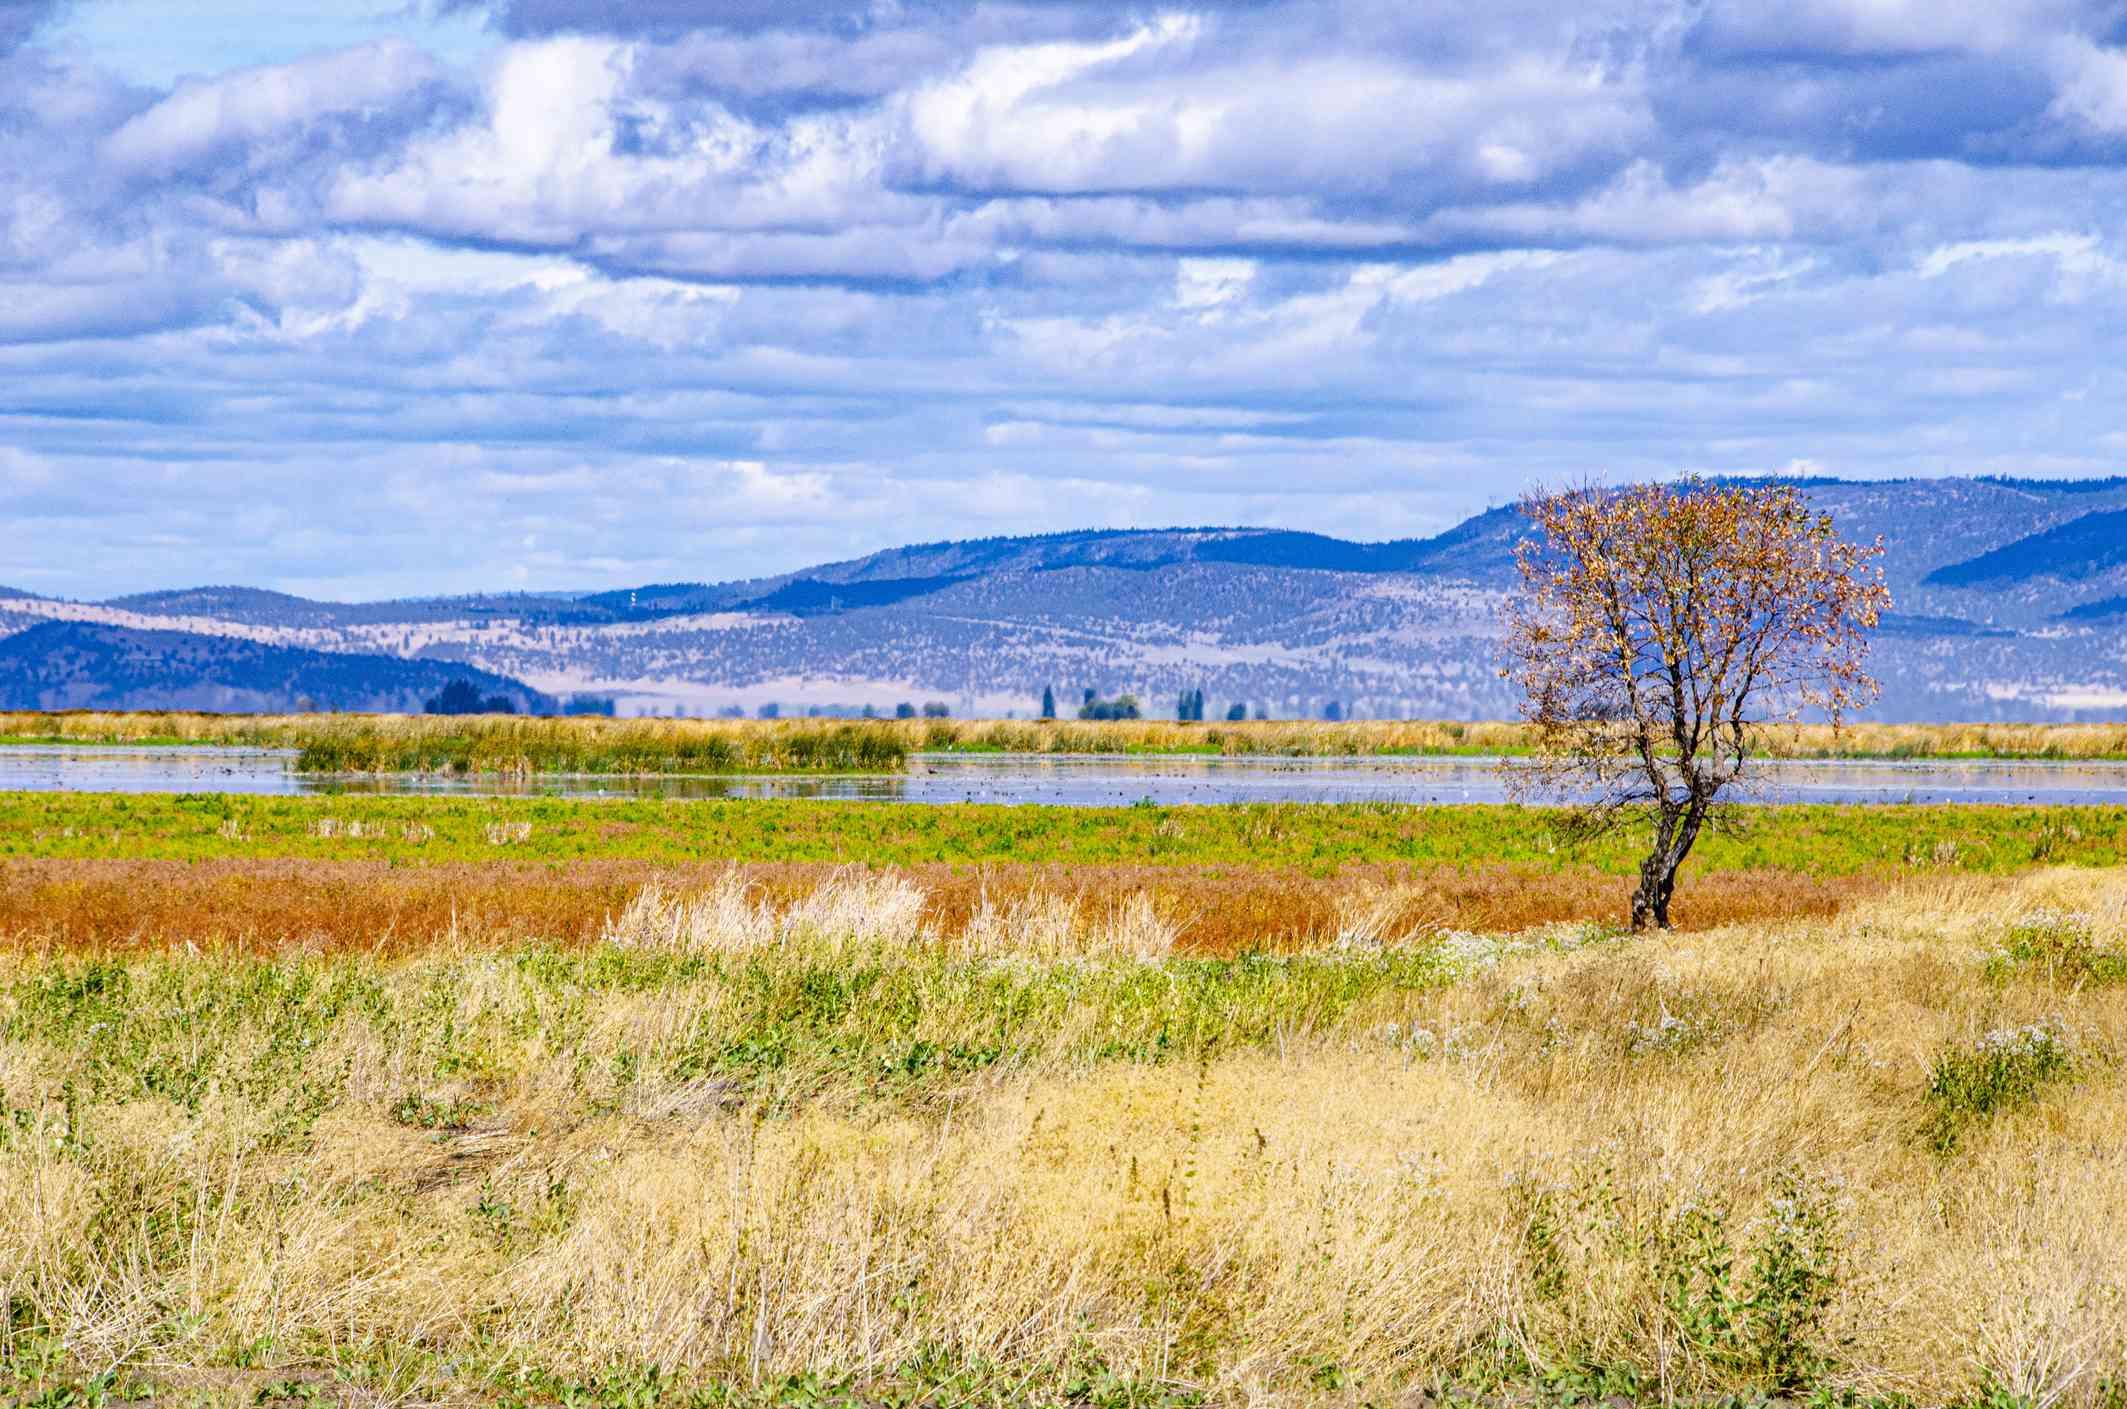 Tule Lake National Wildlife Refuge along California State Route 139